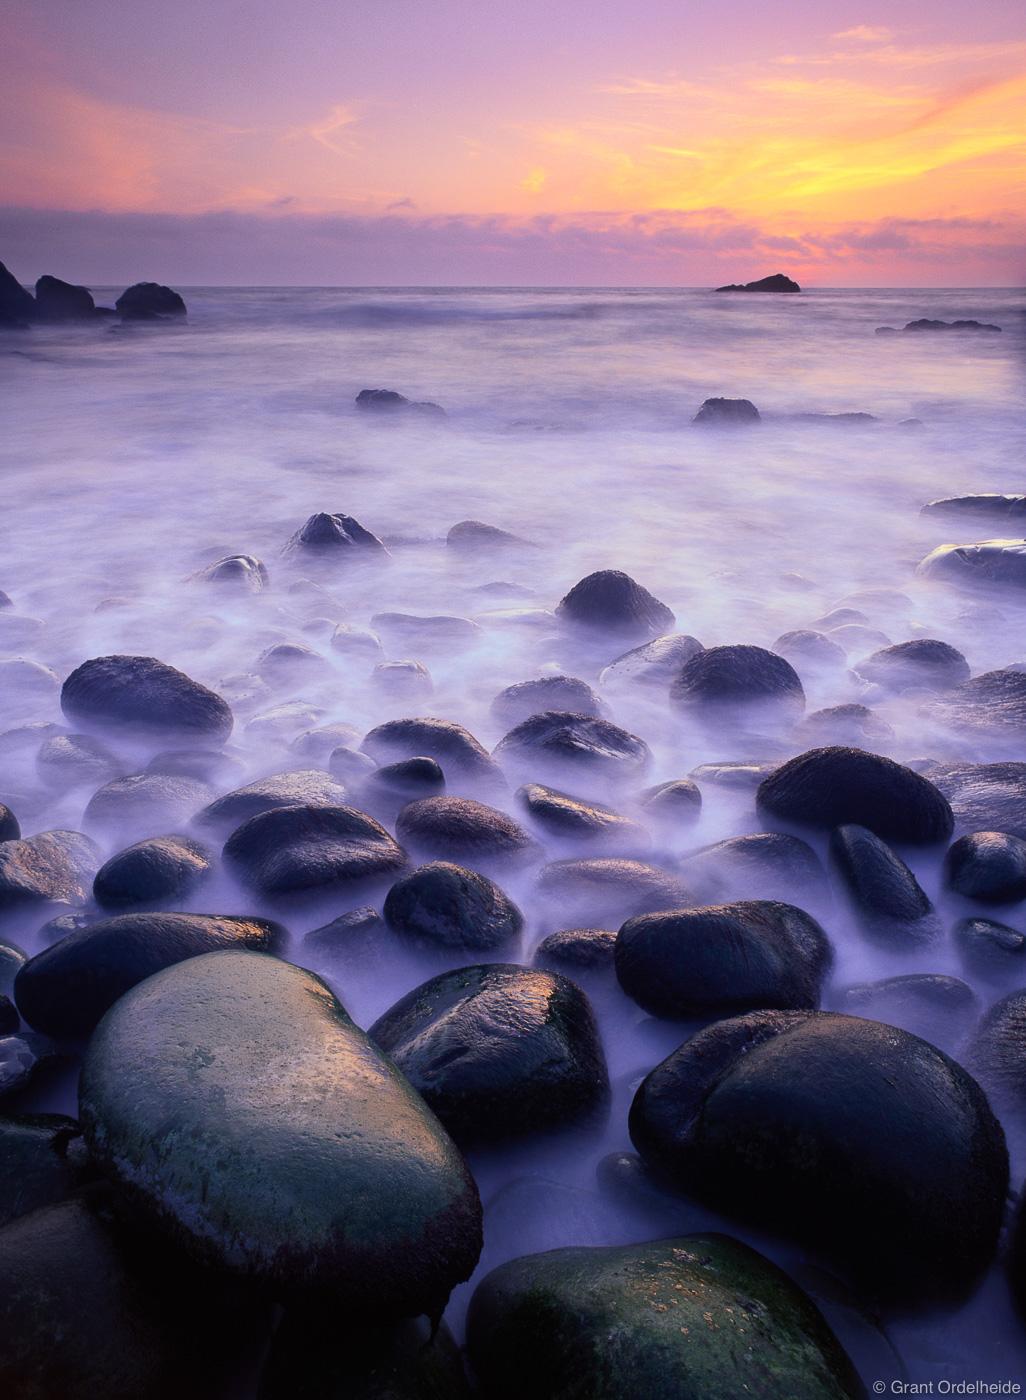 Sunset along the northern Californian coast.